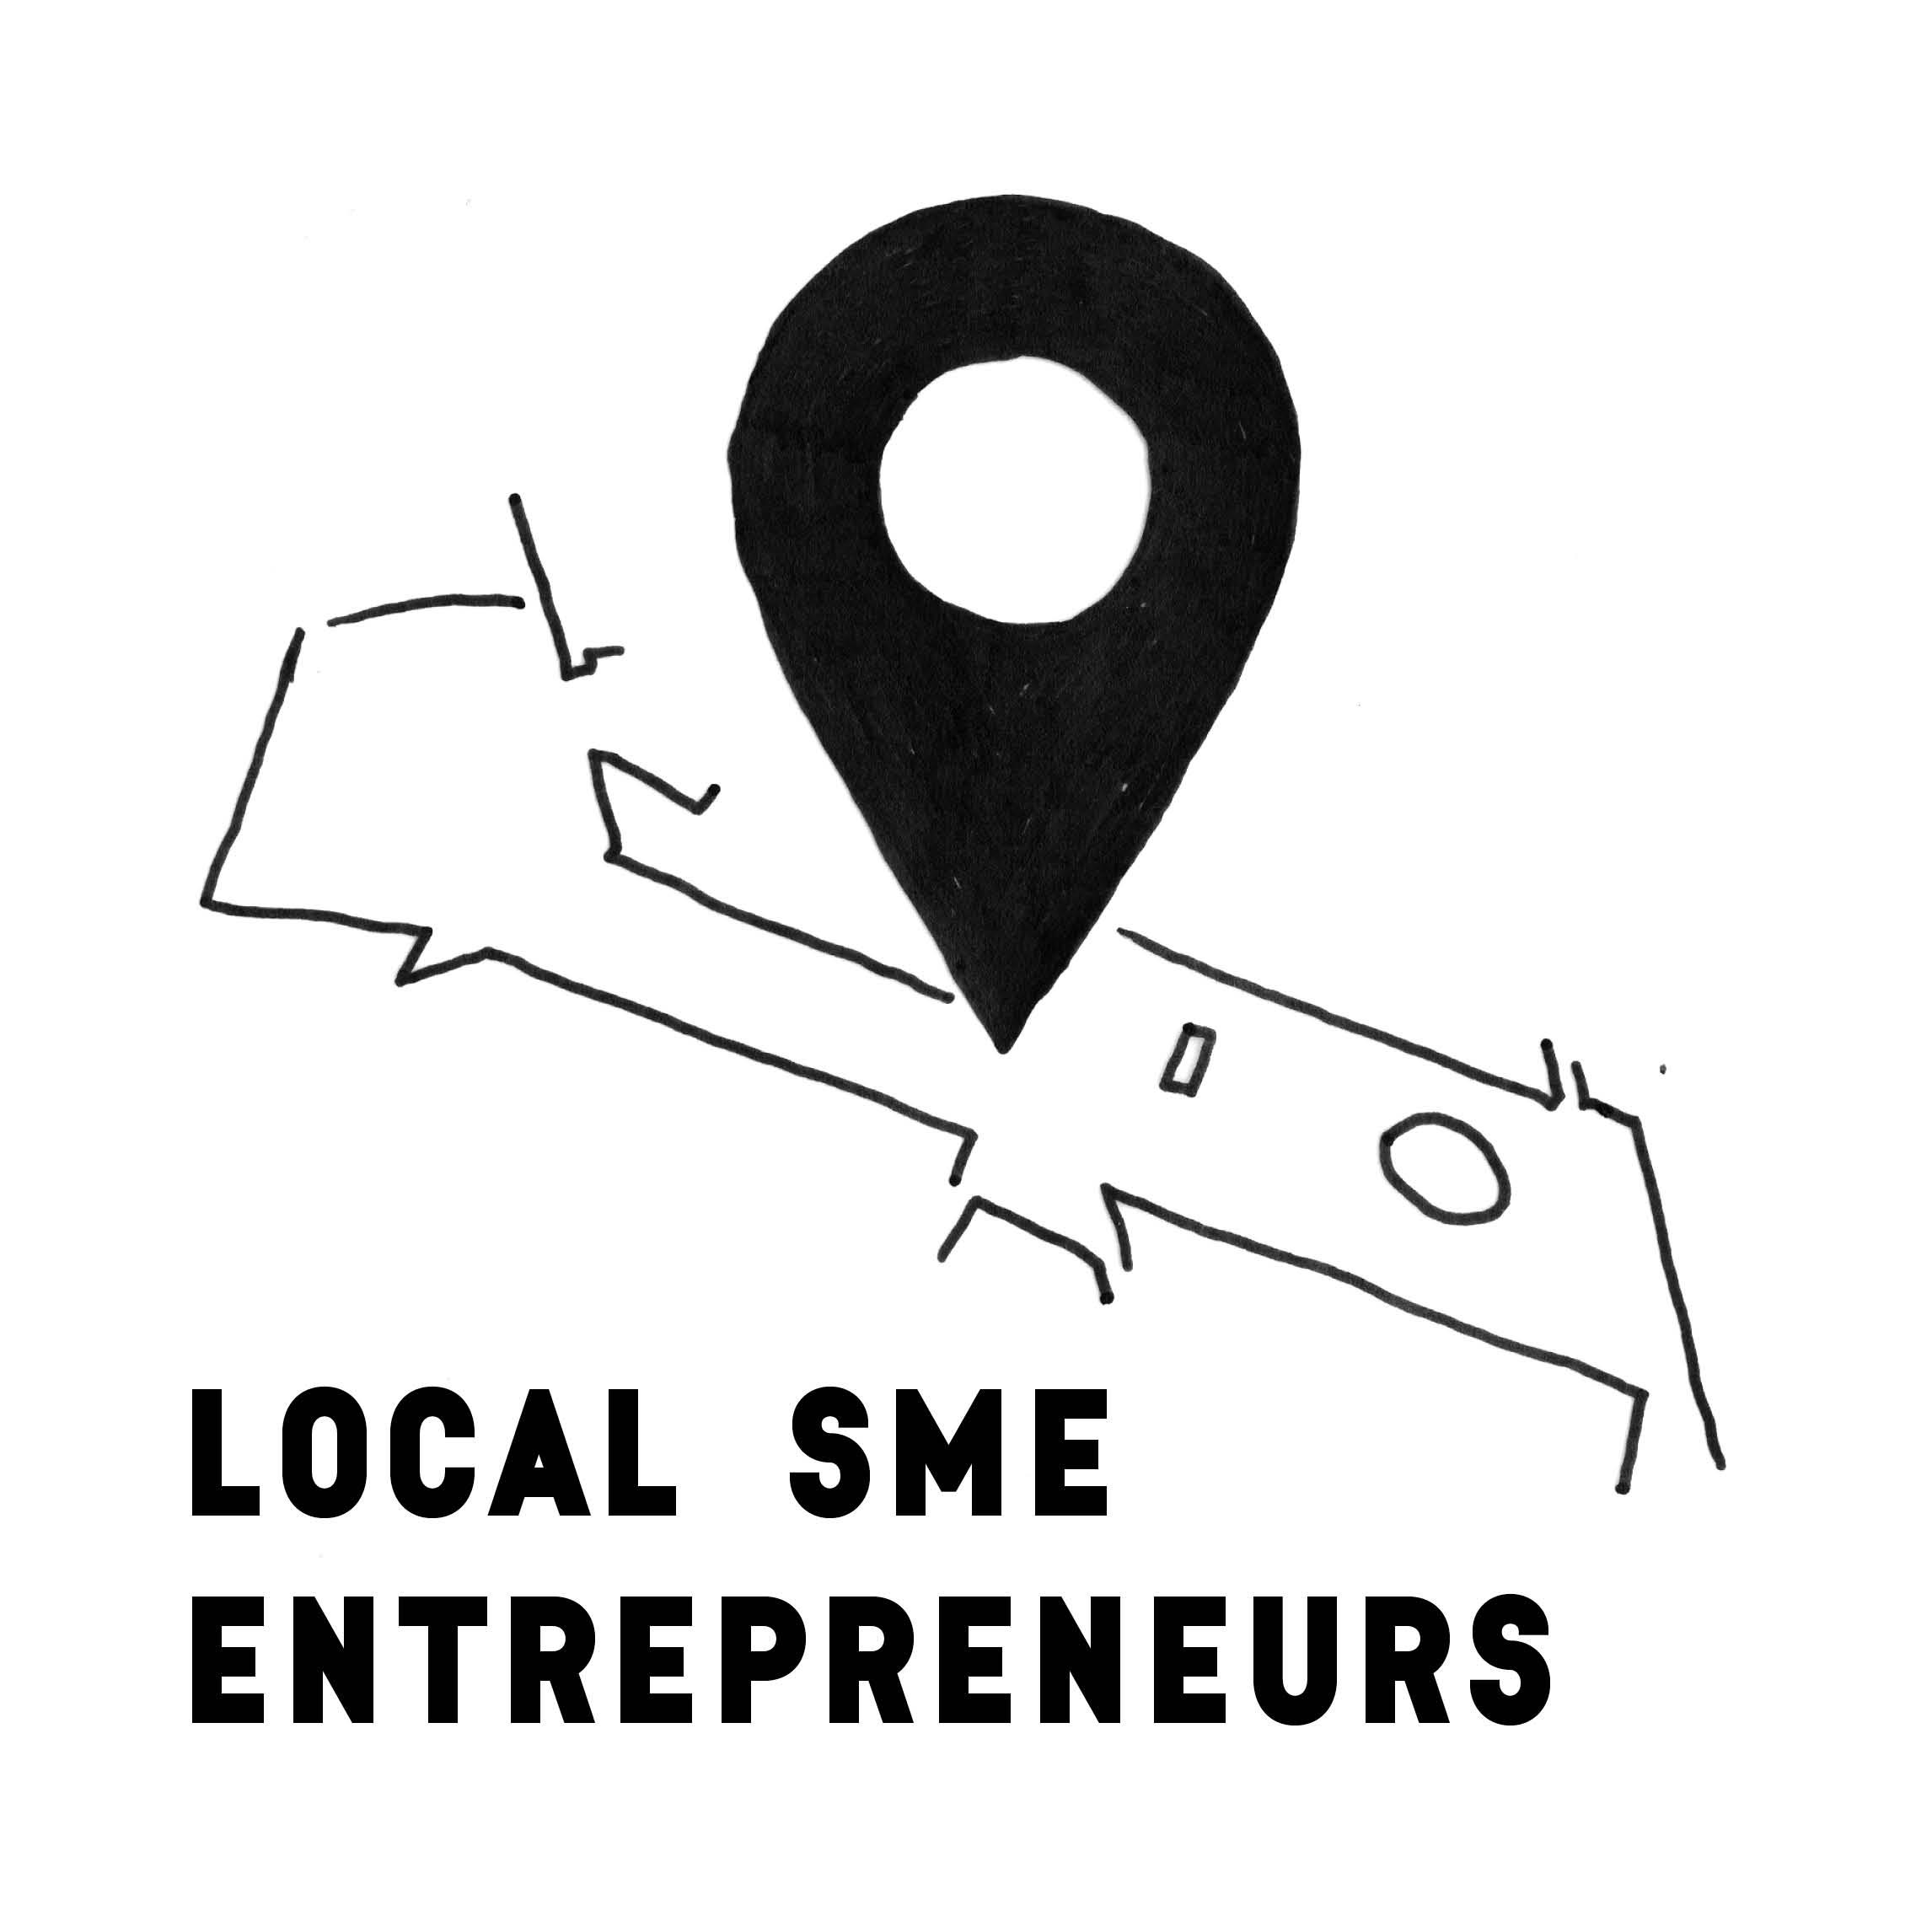 Local SME Entrepreneurs